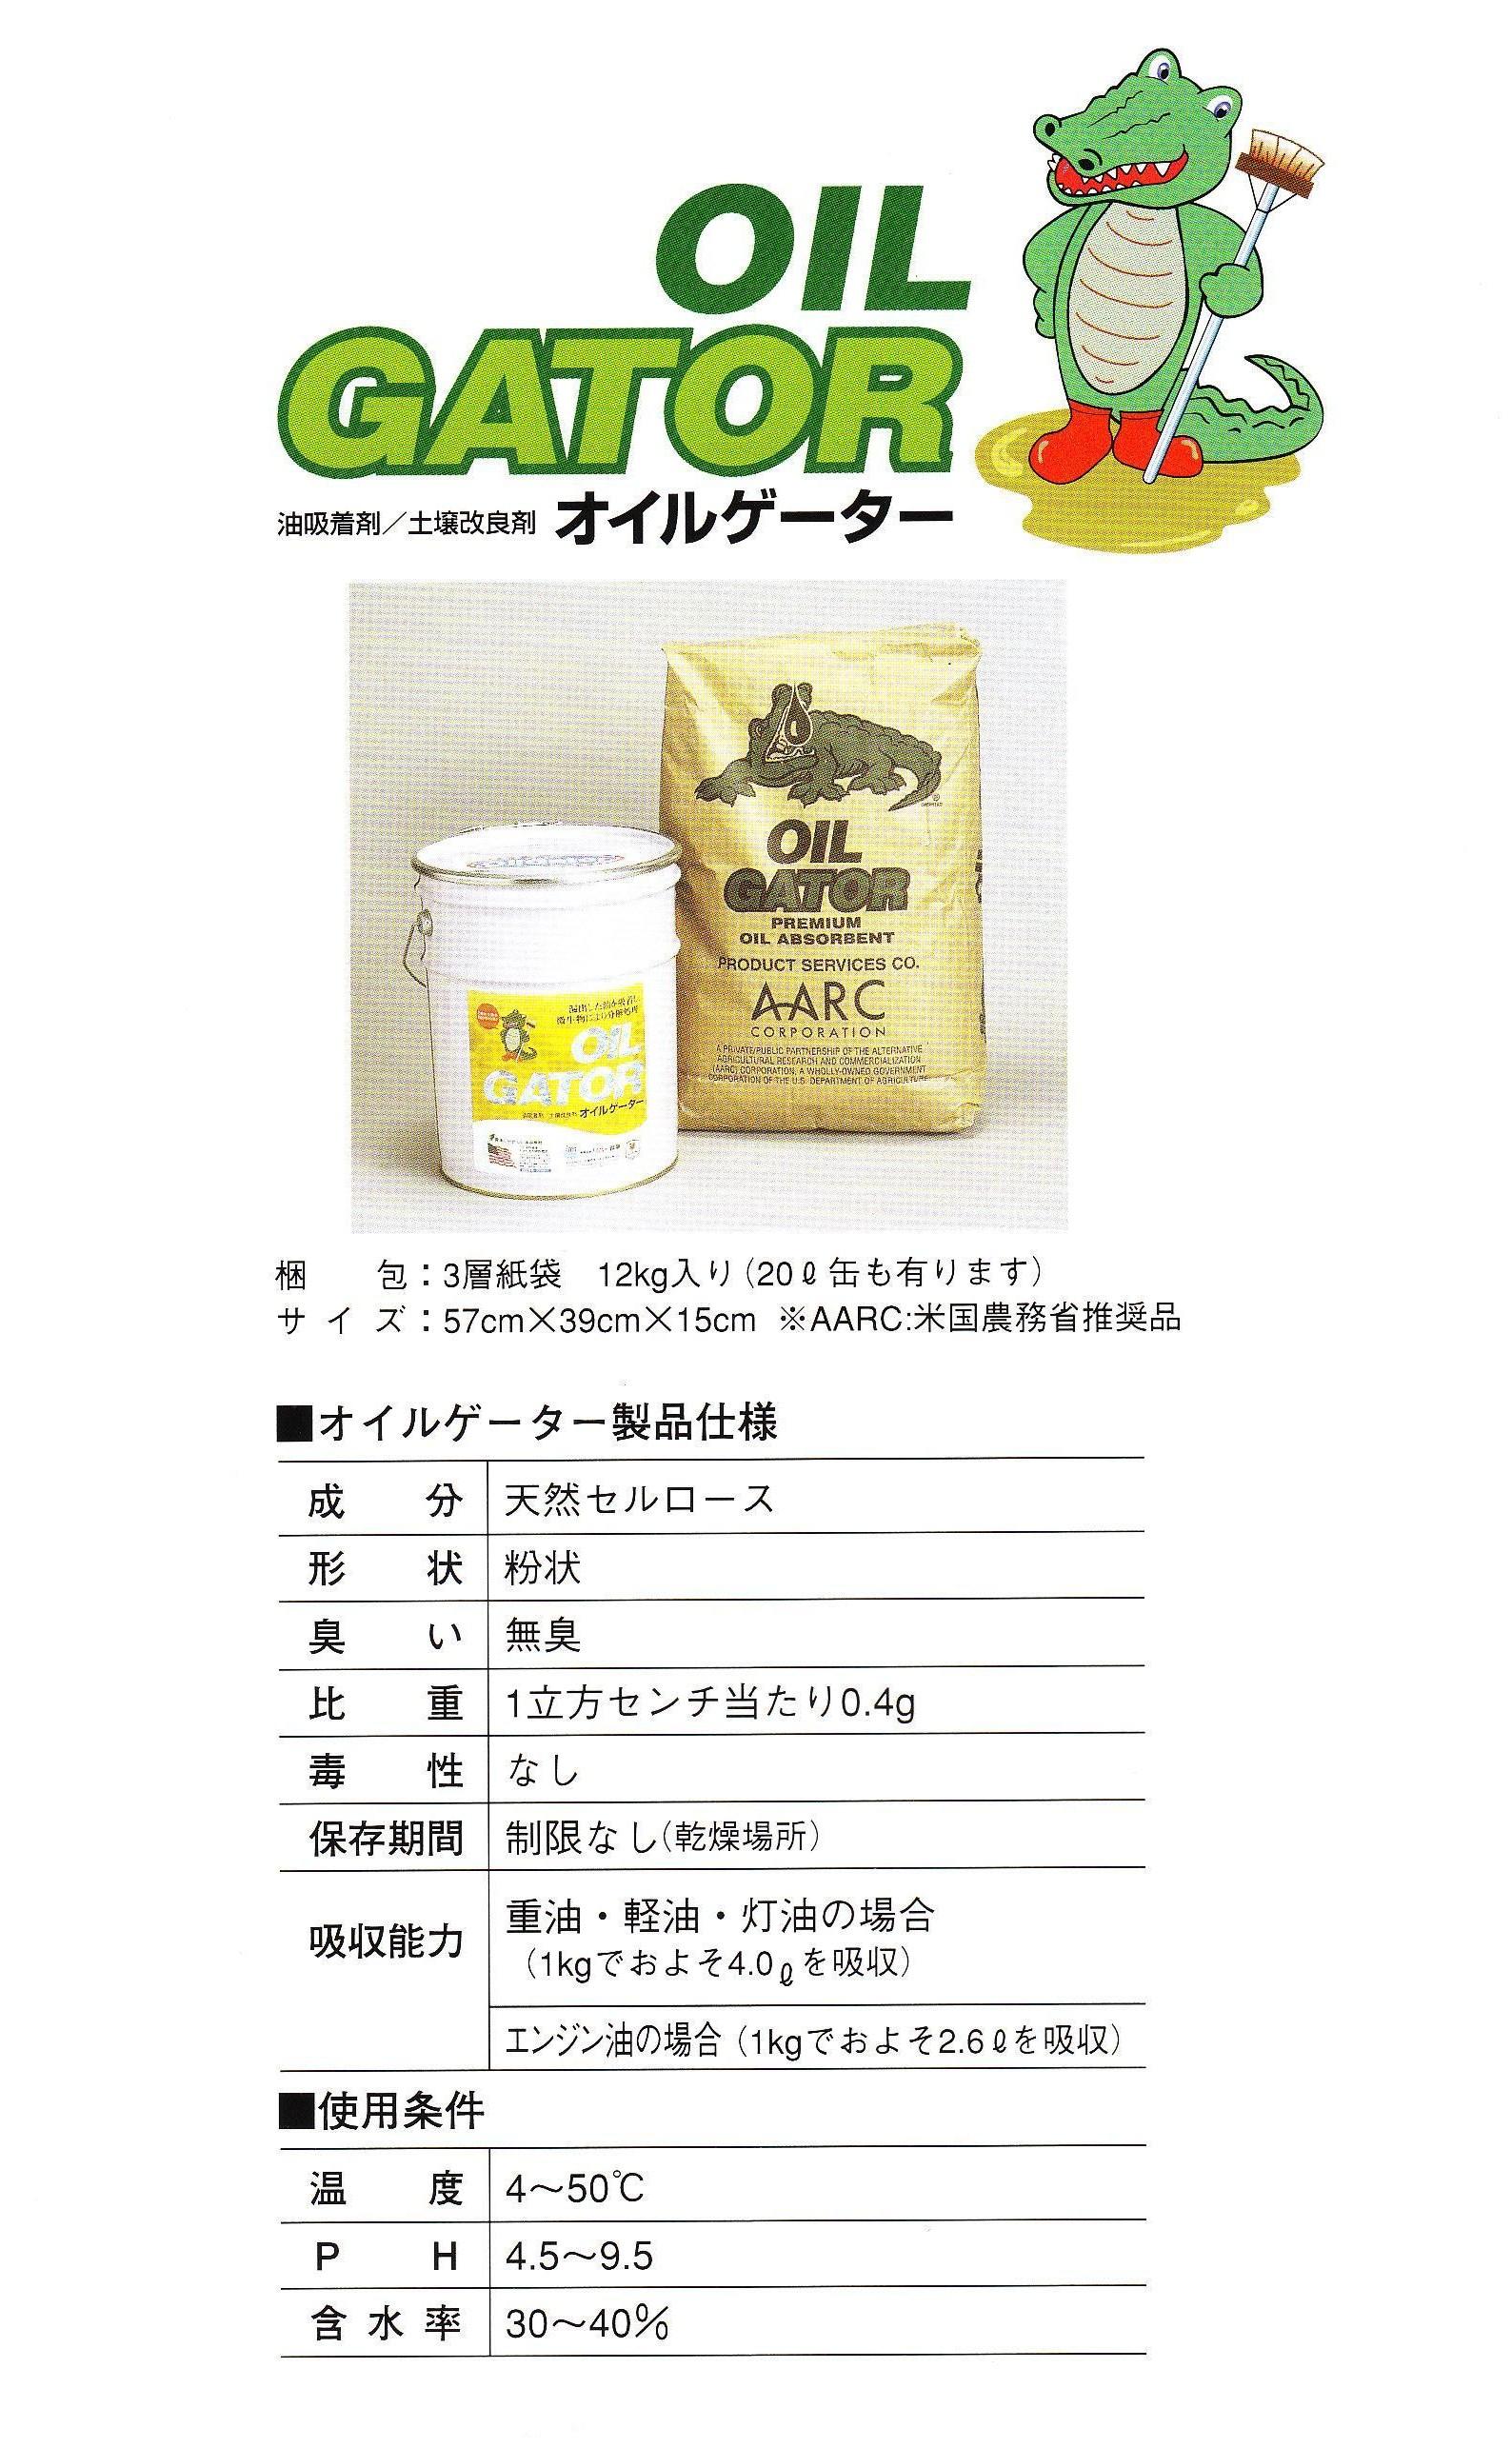 オイルゲーター(油吸着剤/土壌改良剤) 送料無料!(丸缶 10L缶 約3kg 1缶)